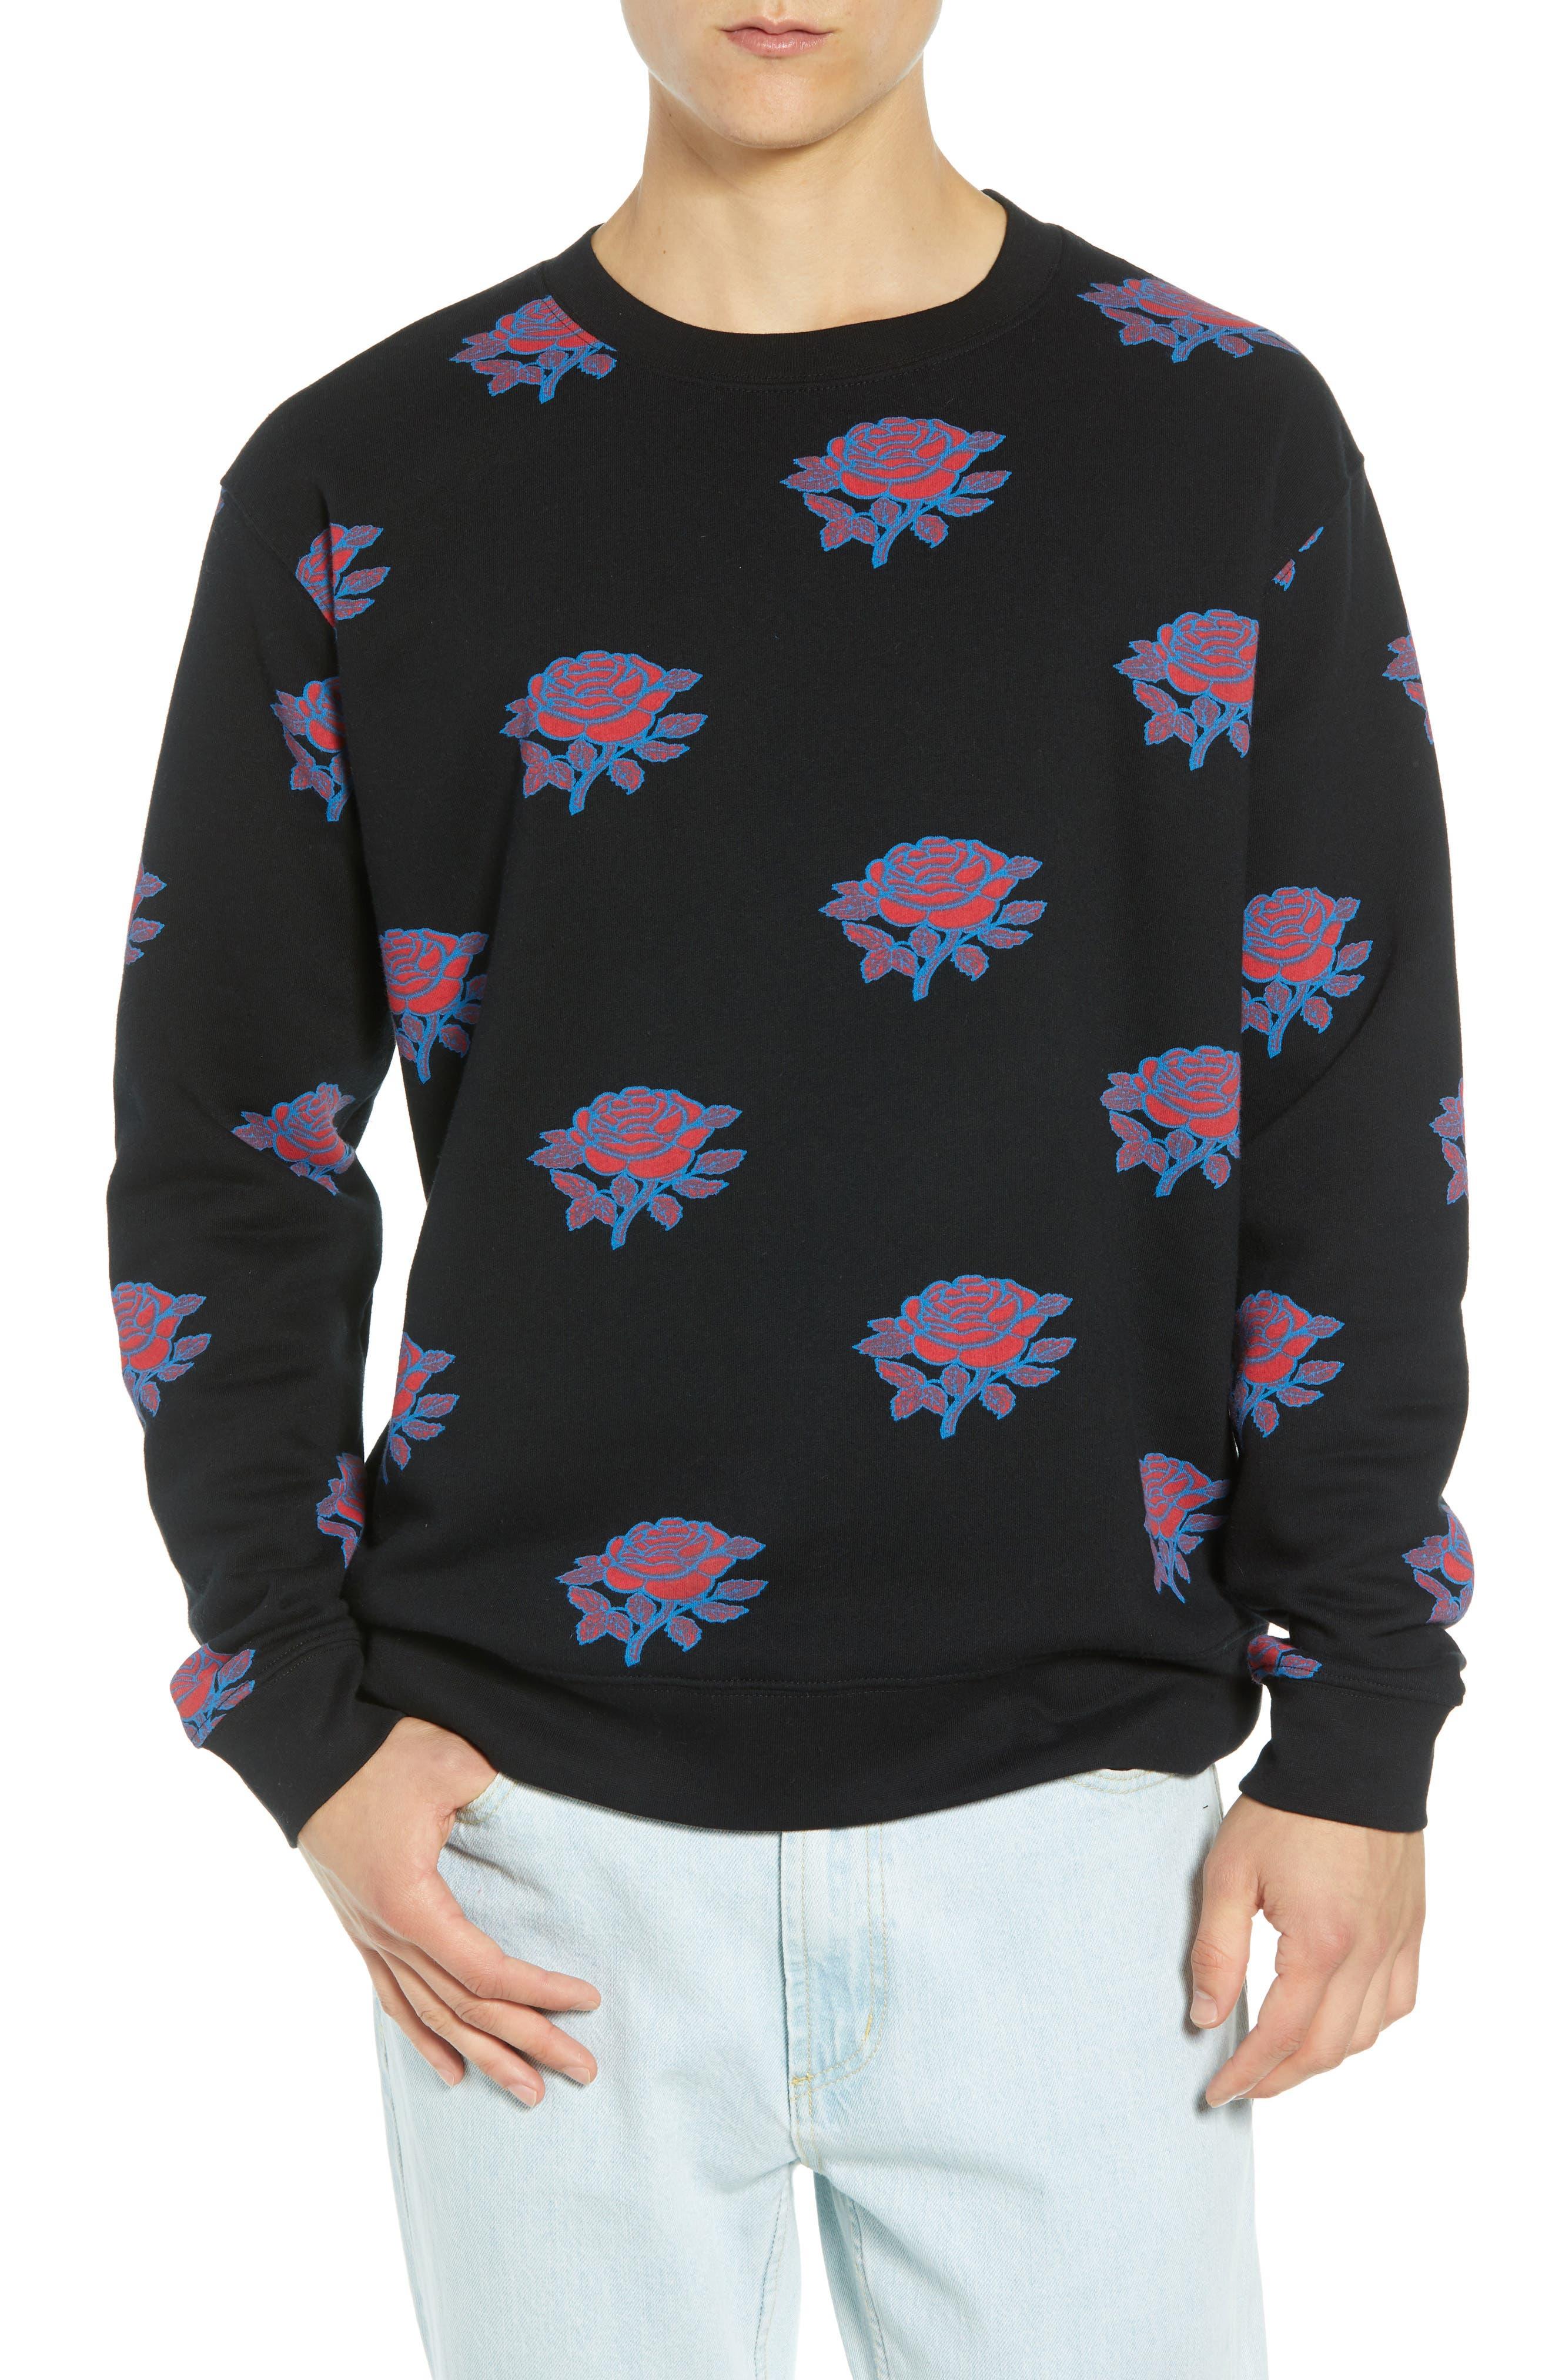 Thorns Crewneck Sweatshirt,                             Main thumbnail 1, color,                             BLACK